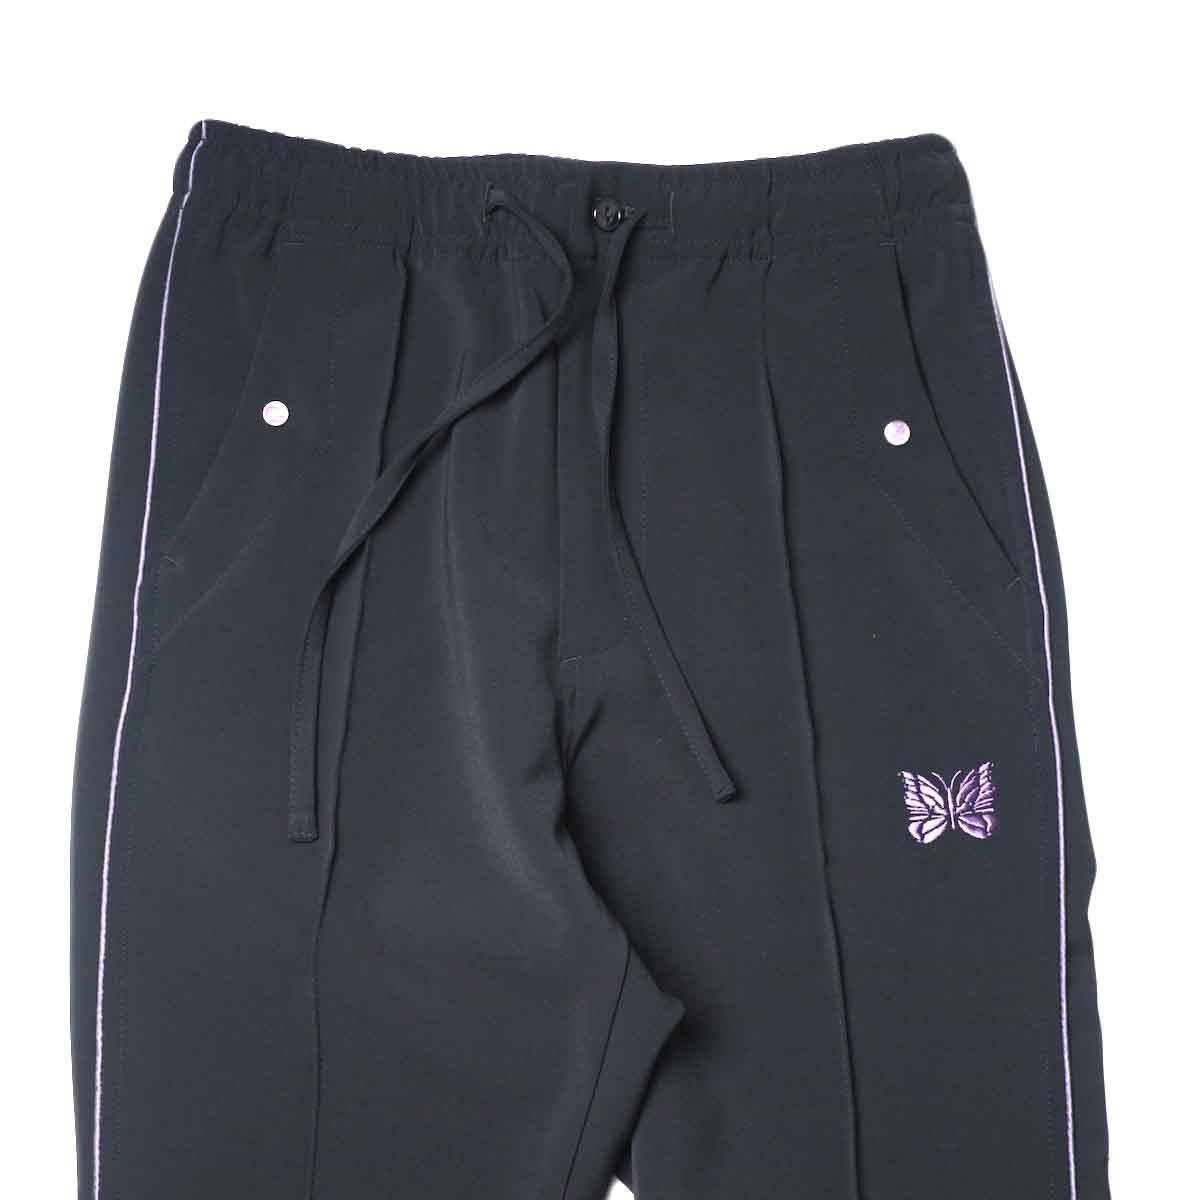 Needles / PIPING COWBOY PANT - PE/PU DOUBLE CLOTH (Black)ウエスト